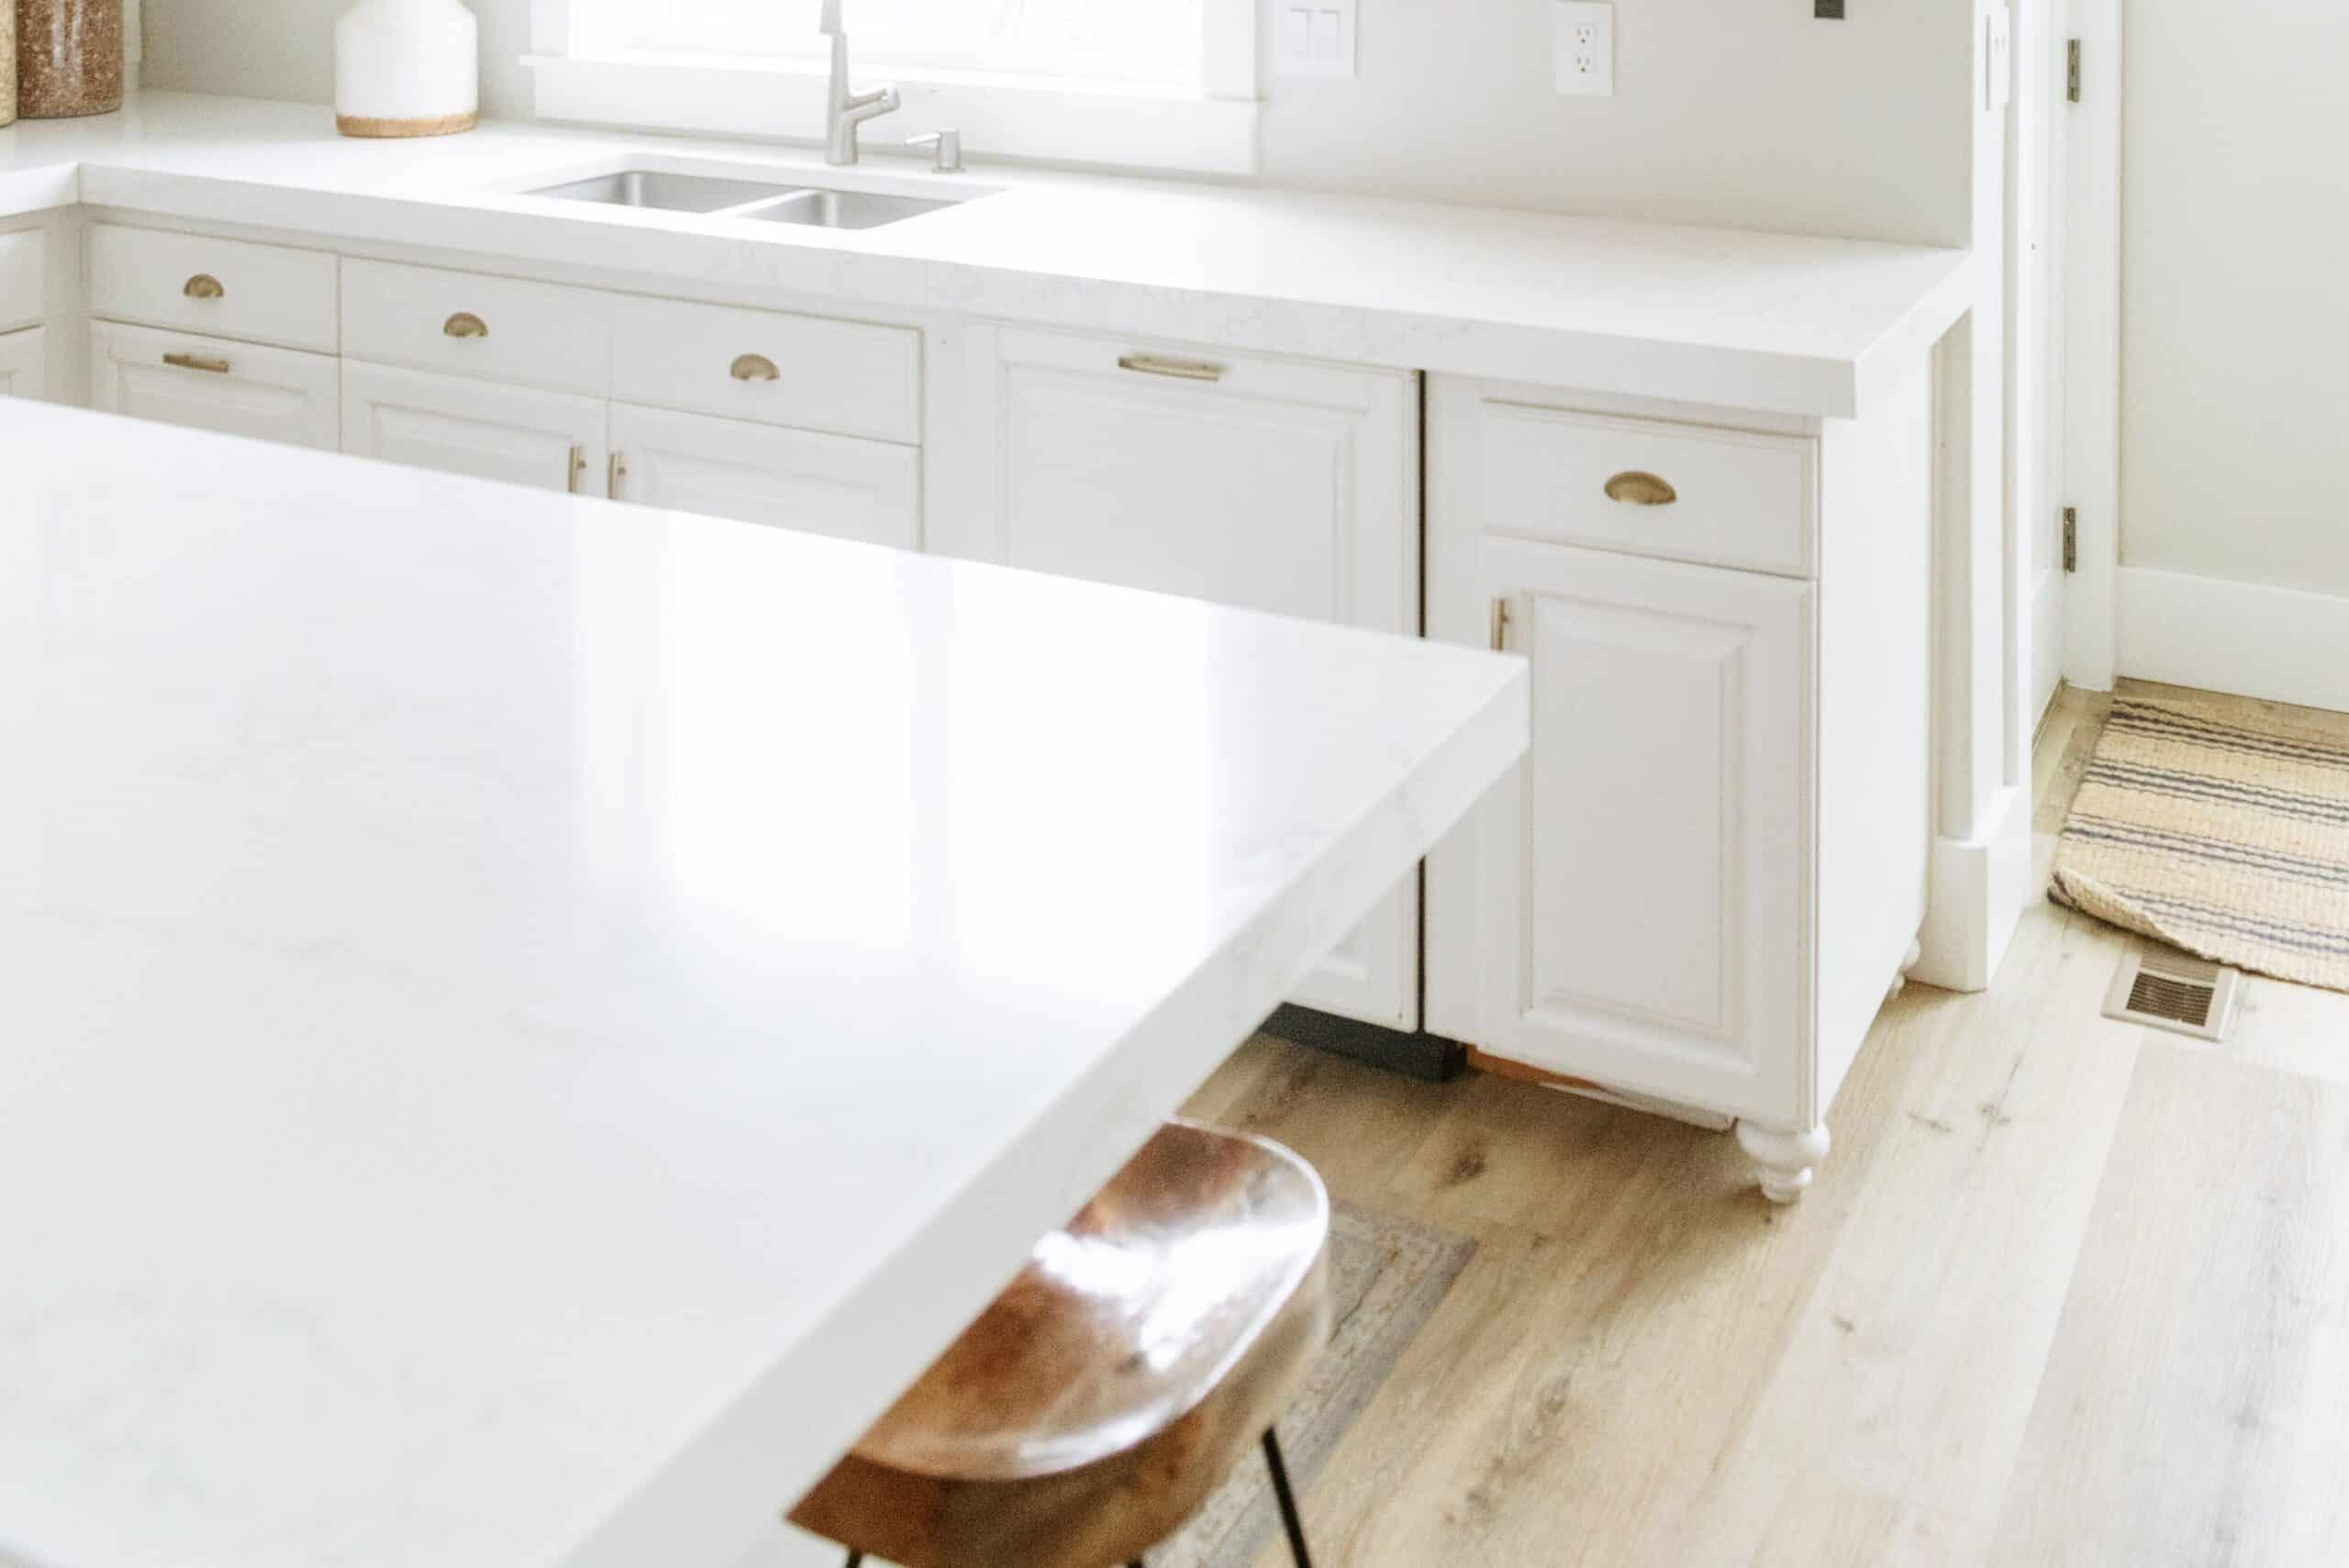 Maintaining your Quartz Counter tops